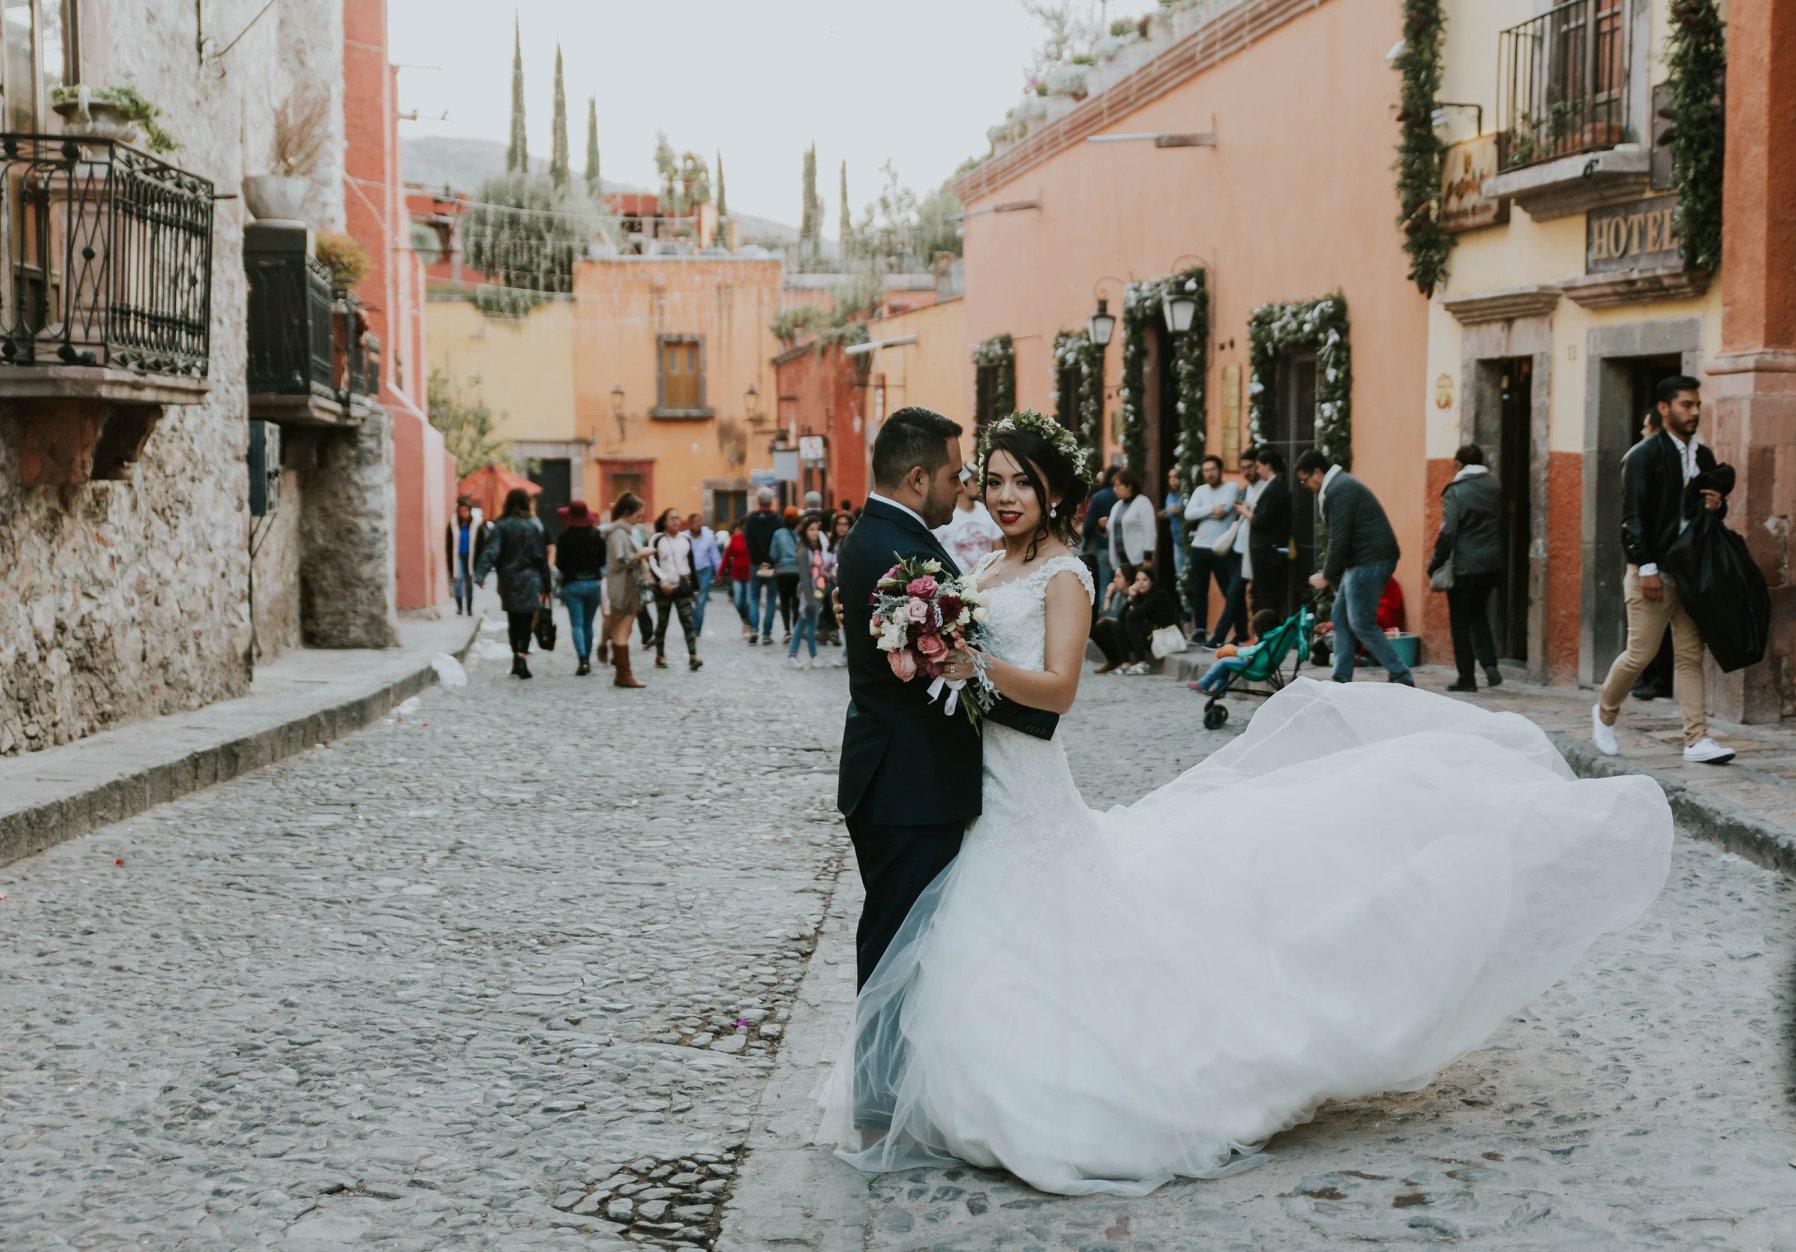 oklahoma wedding photographer on location